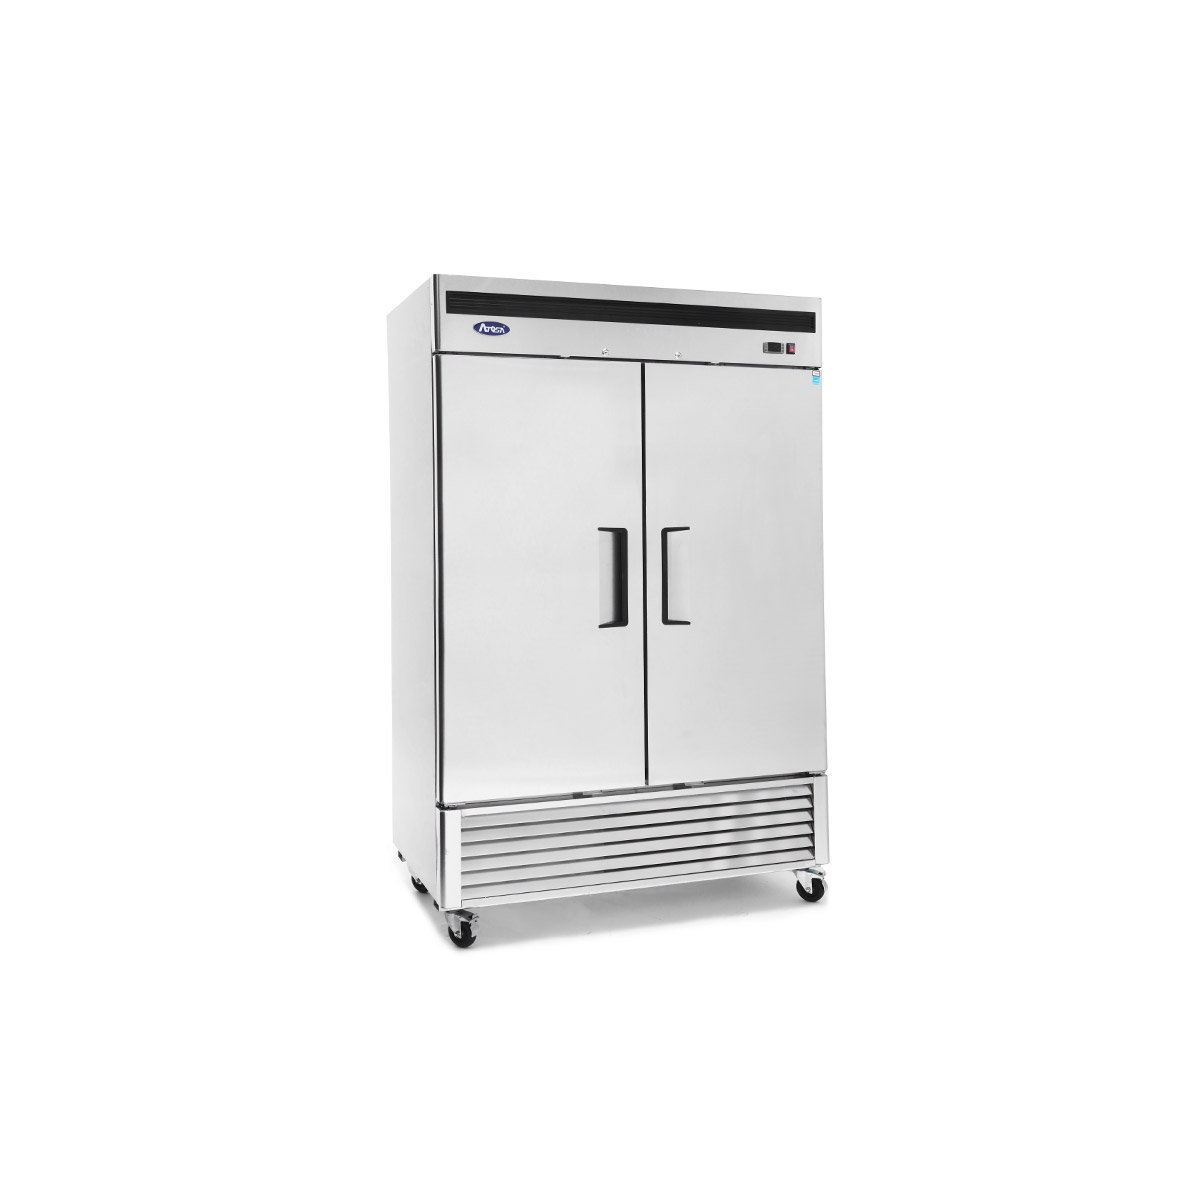 Atosa MBF8183GR Double Door Upright Freezer 1300 Litres